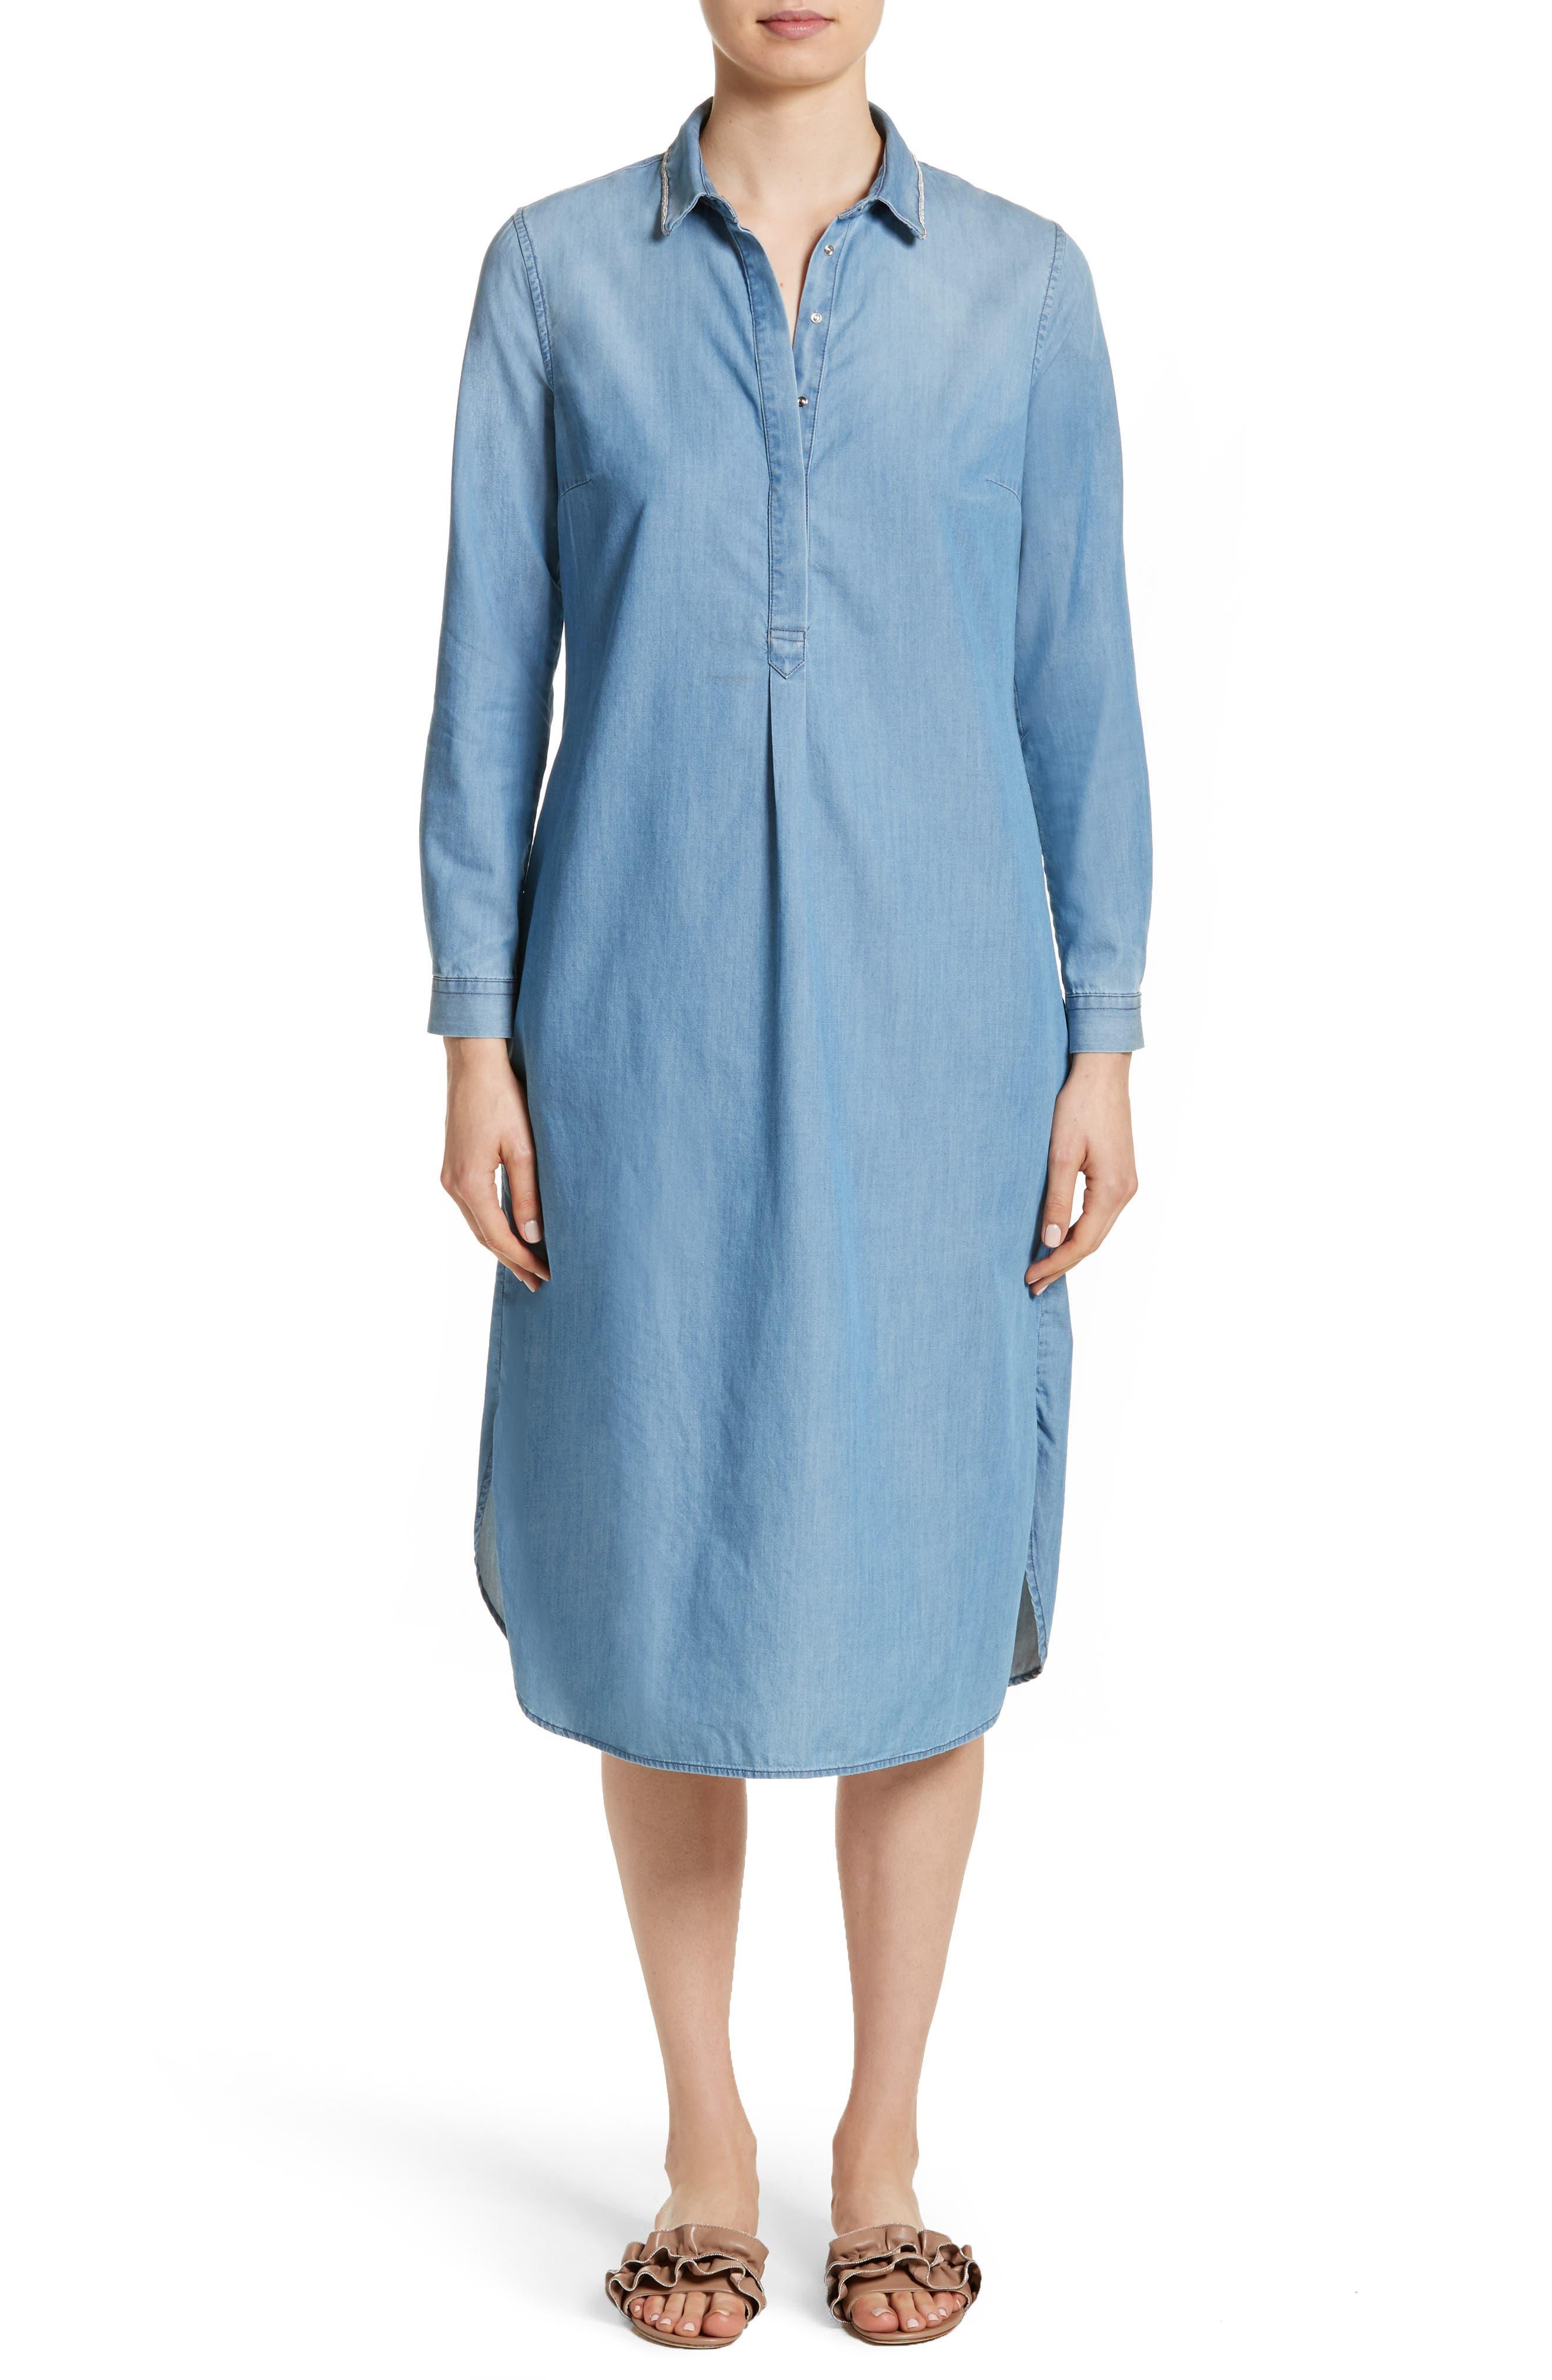 Cotton & Cashmere Chambray Shirtdress,                             Main thumbnail 1, color,                             Denim Blue